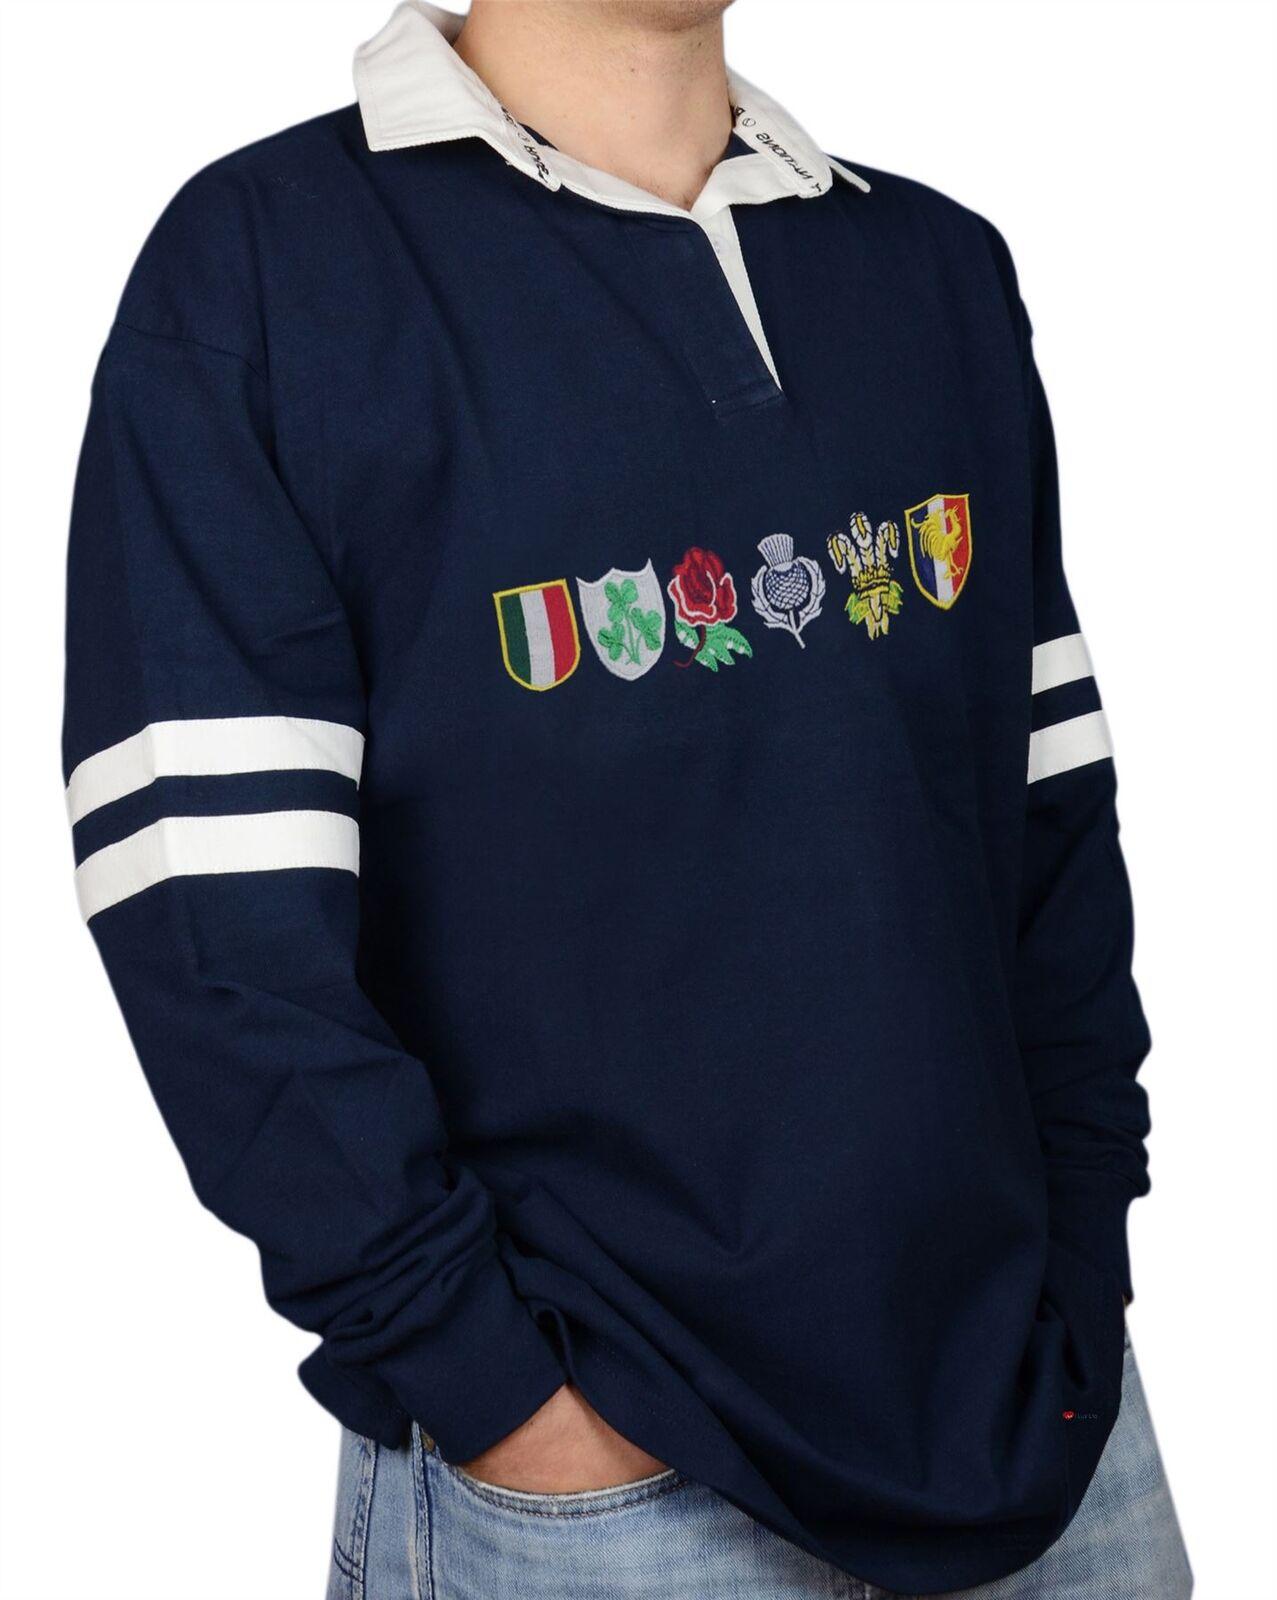 Mens Rugby Shirt - - - RBS Six Nations Navy Long Sleeve with Country Logos Medium  | eine große Vielfalt  f52900